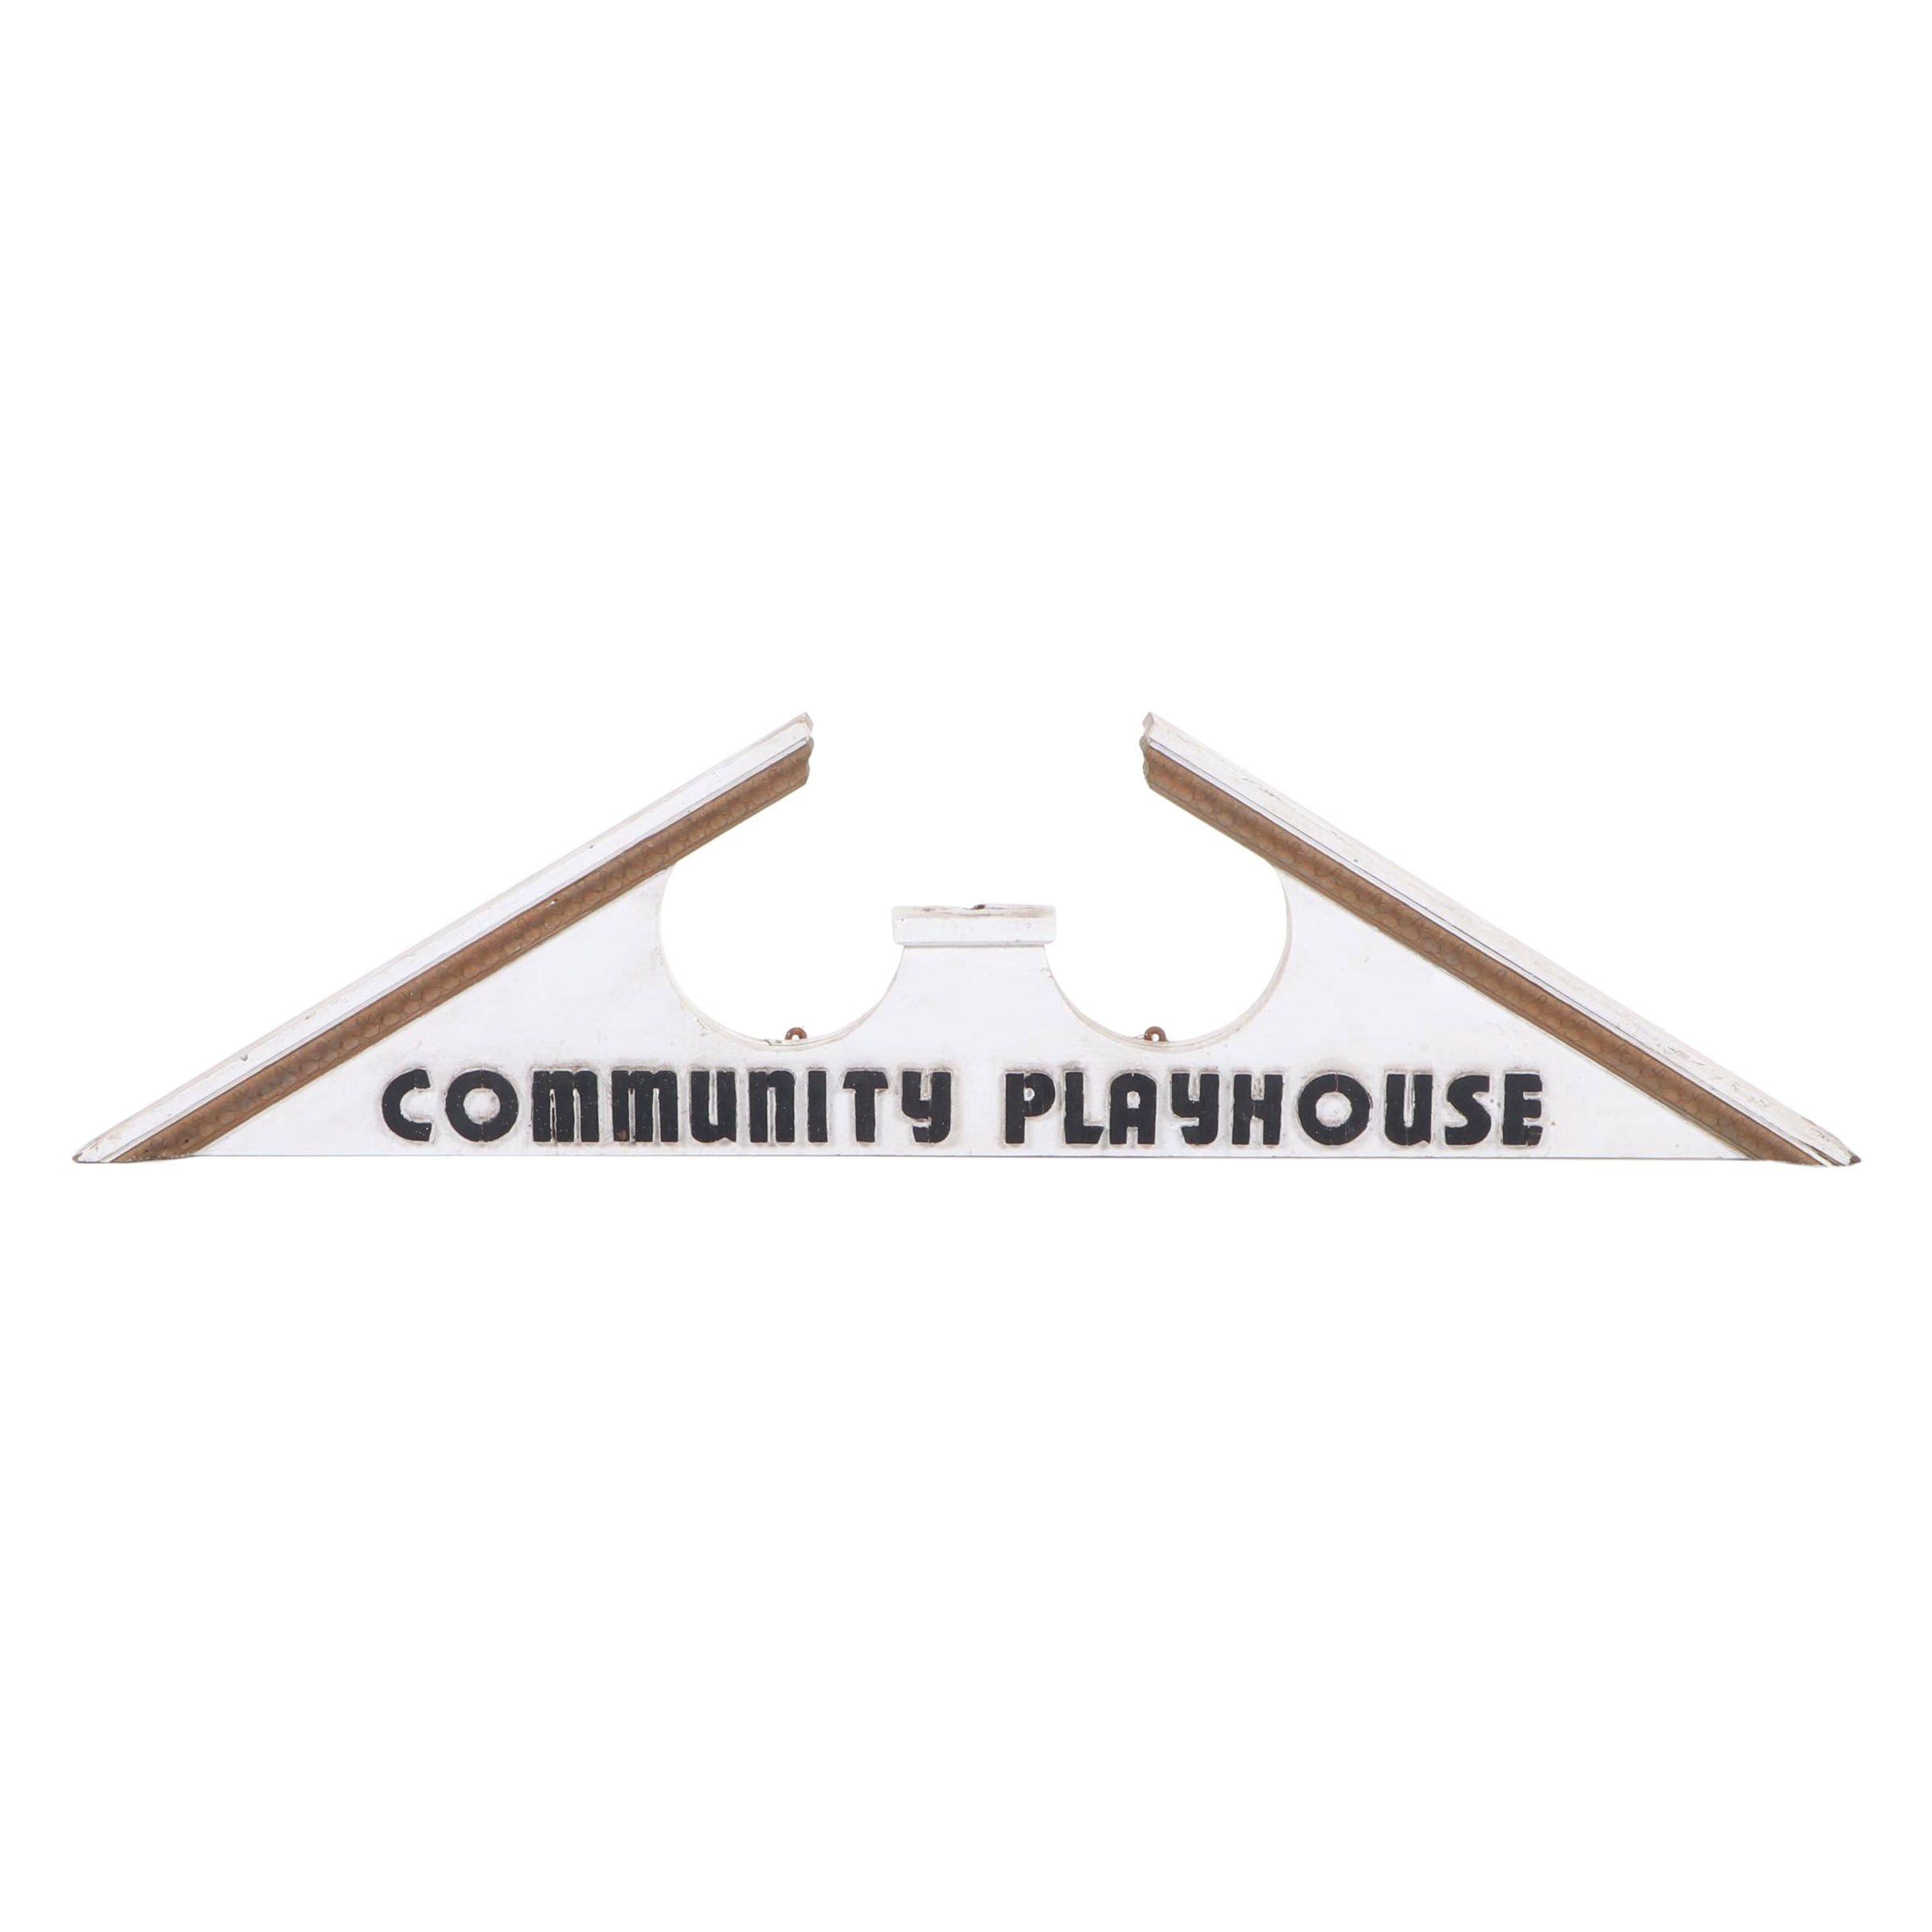 Community Playhouse Architectural Pediment Sign